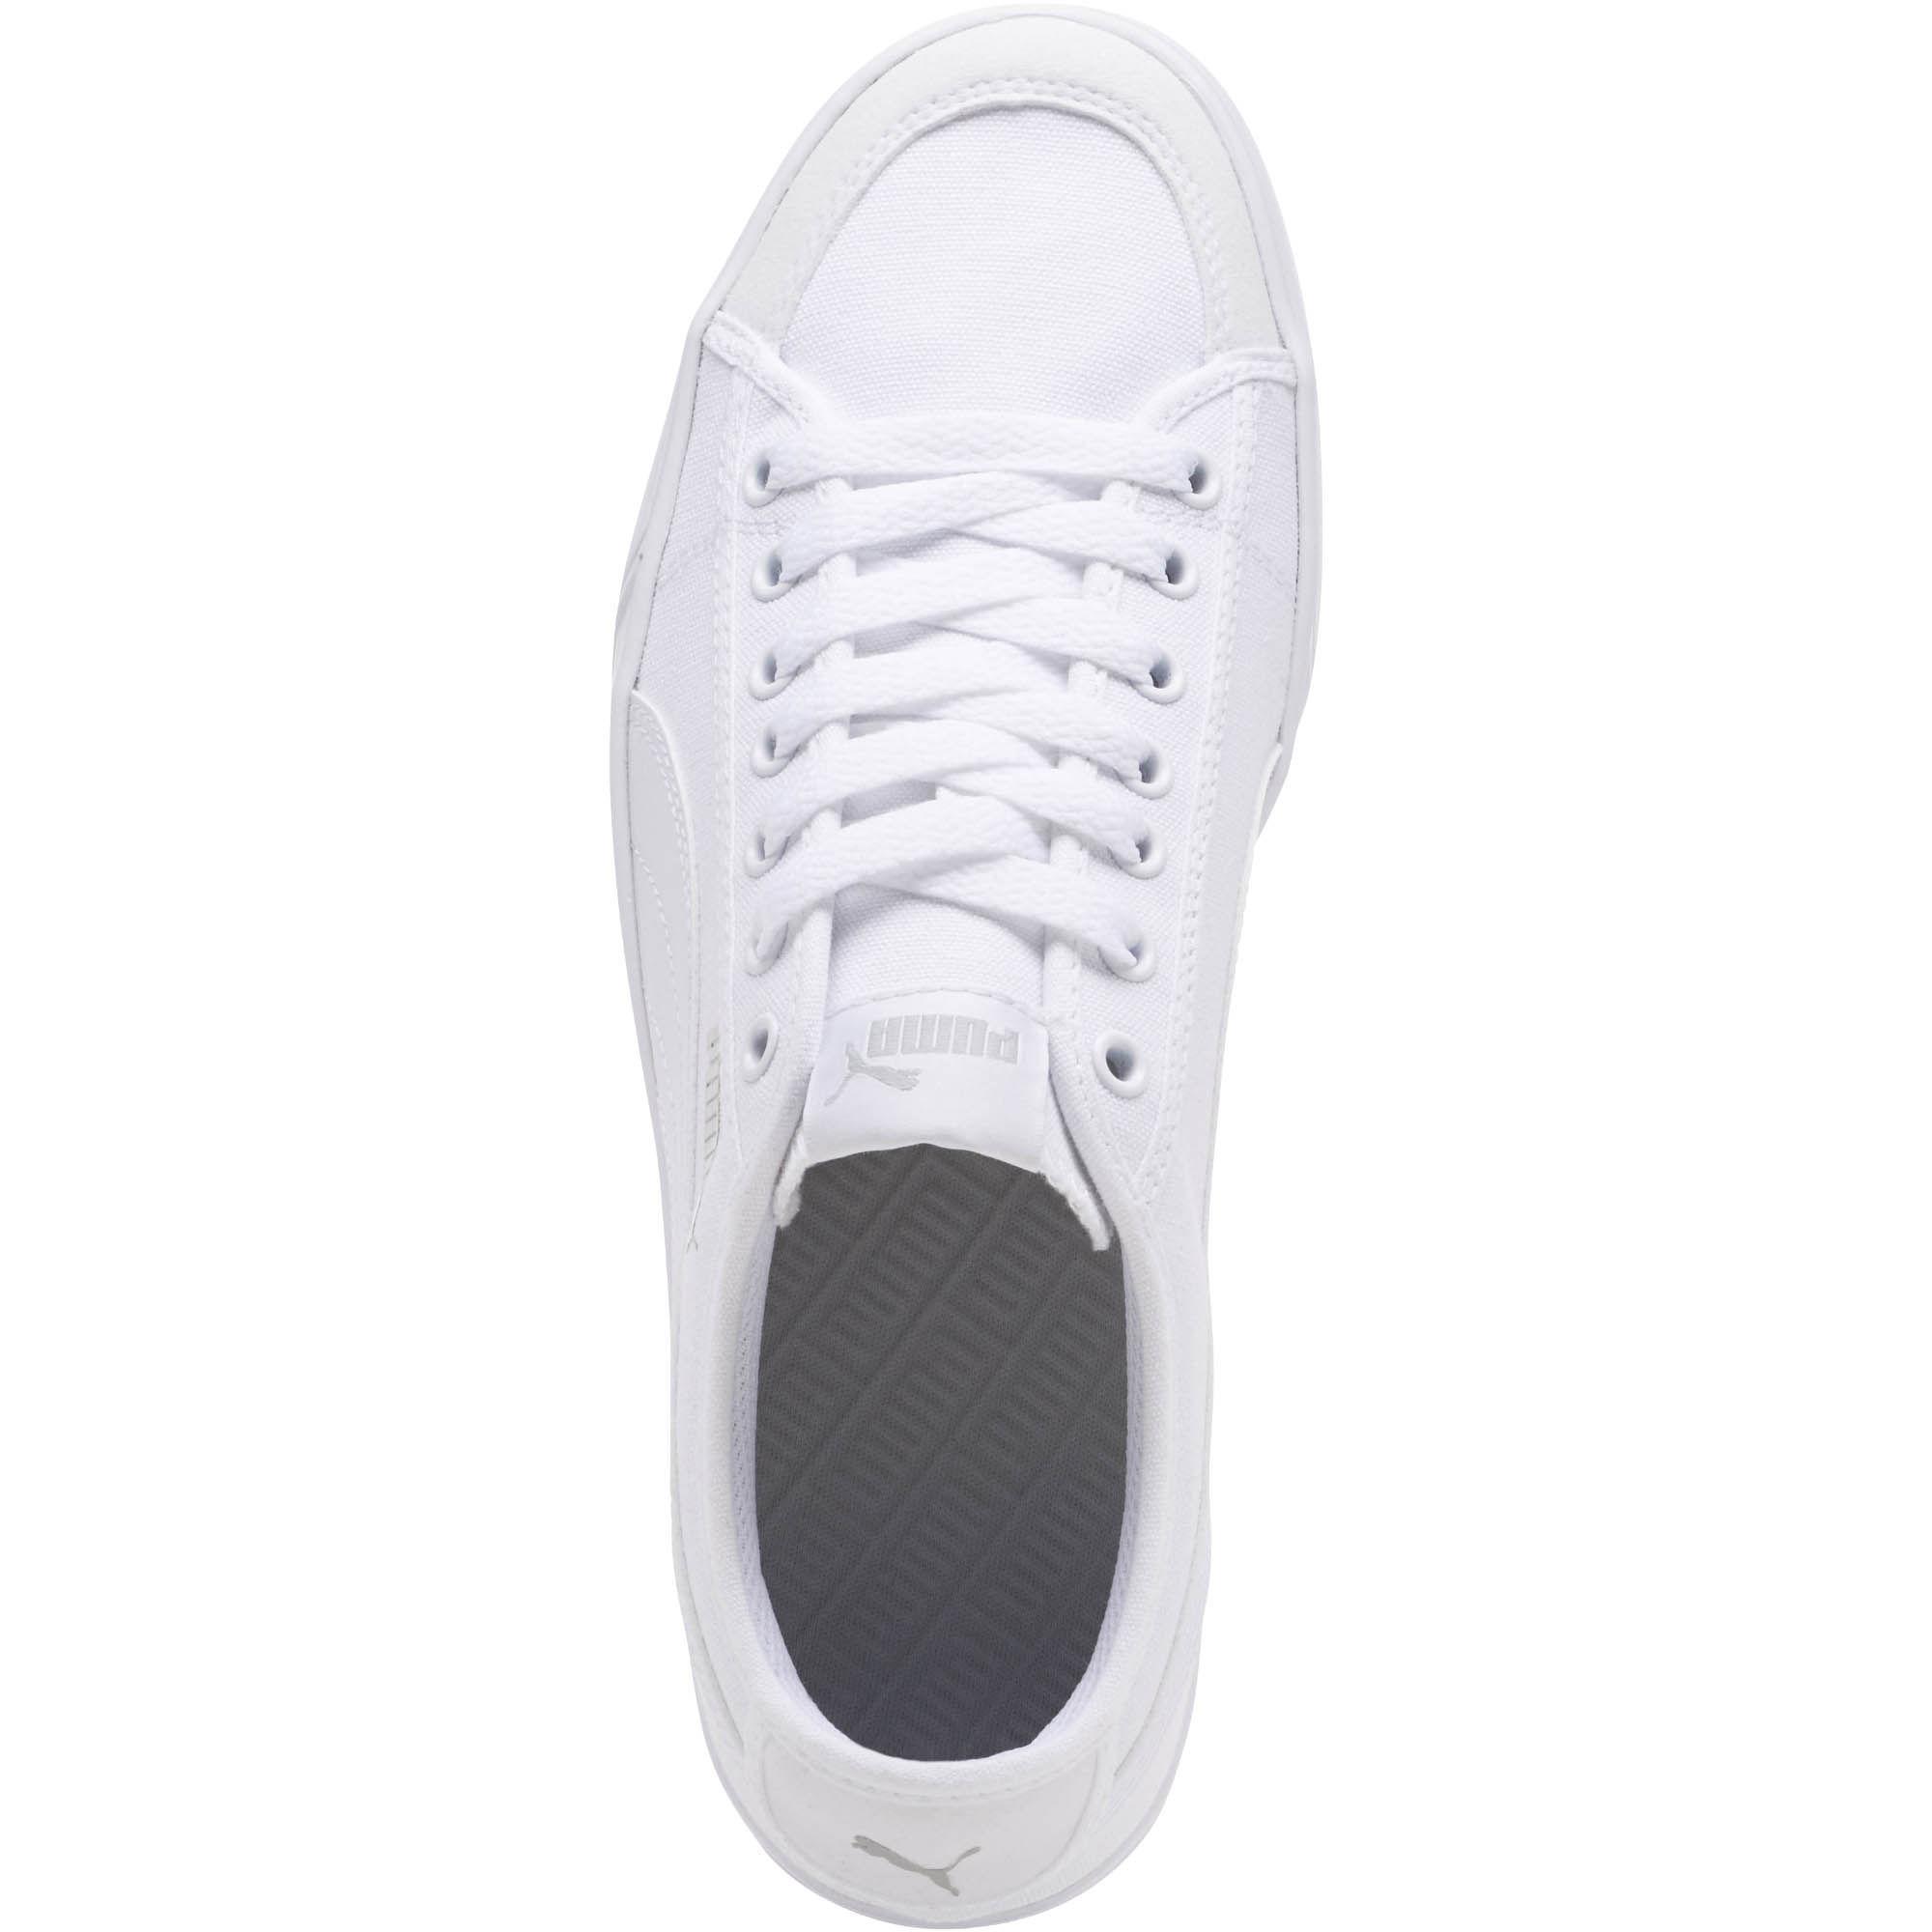 uk availability 900a6 4e2d5 PUMA White Smash V2 Vulc Cv Men's Sneakers for men